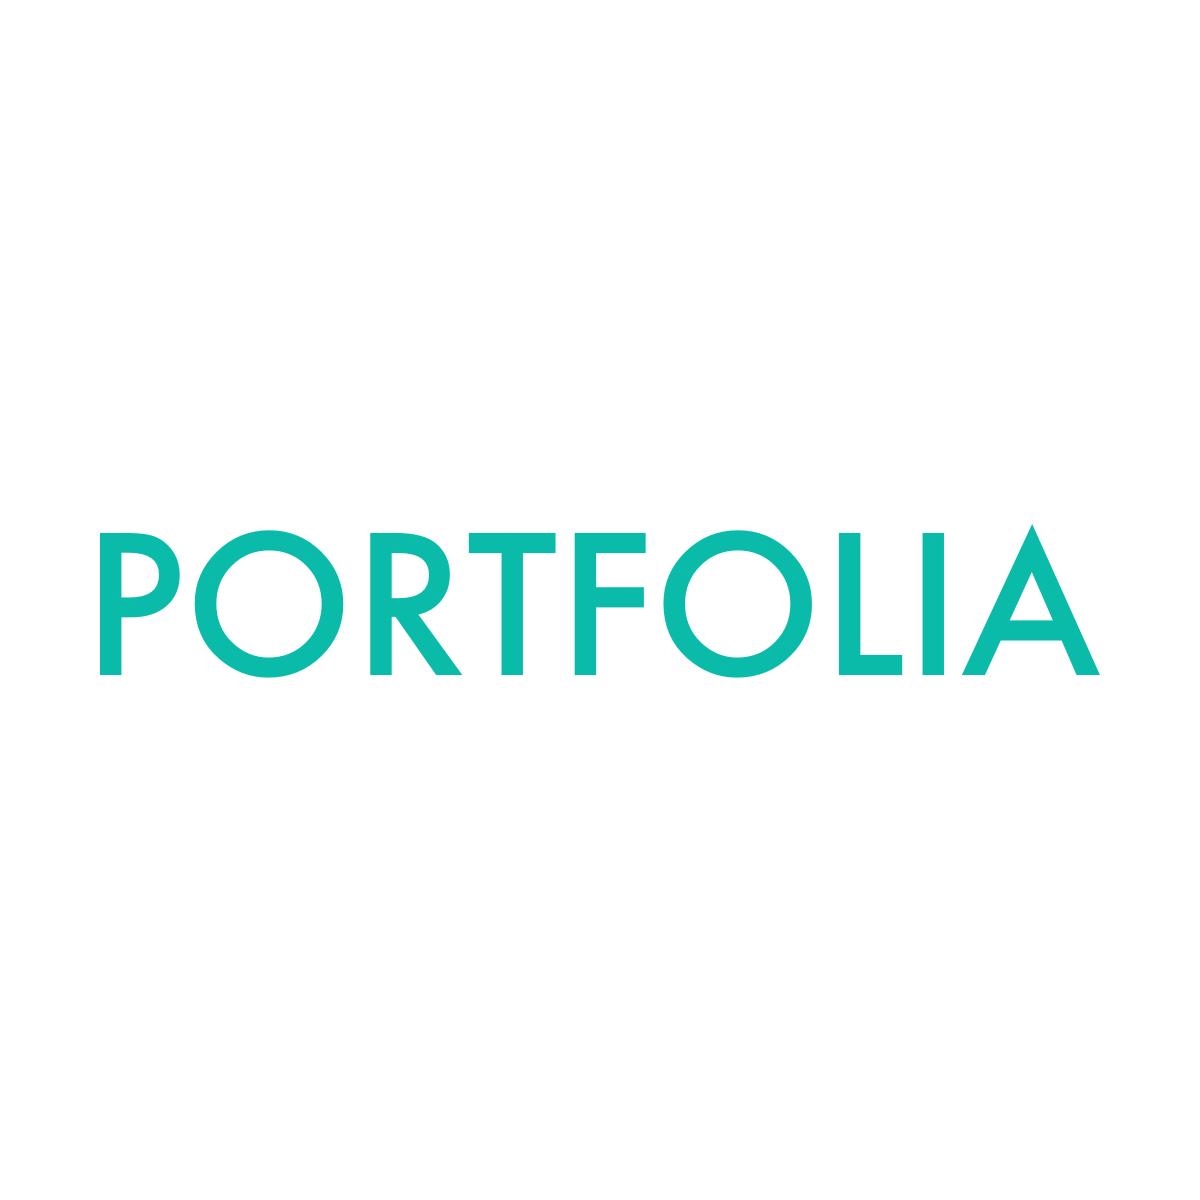 Portfolia_new logo_square_light@2x.png